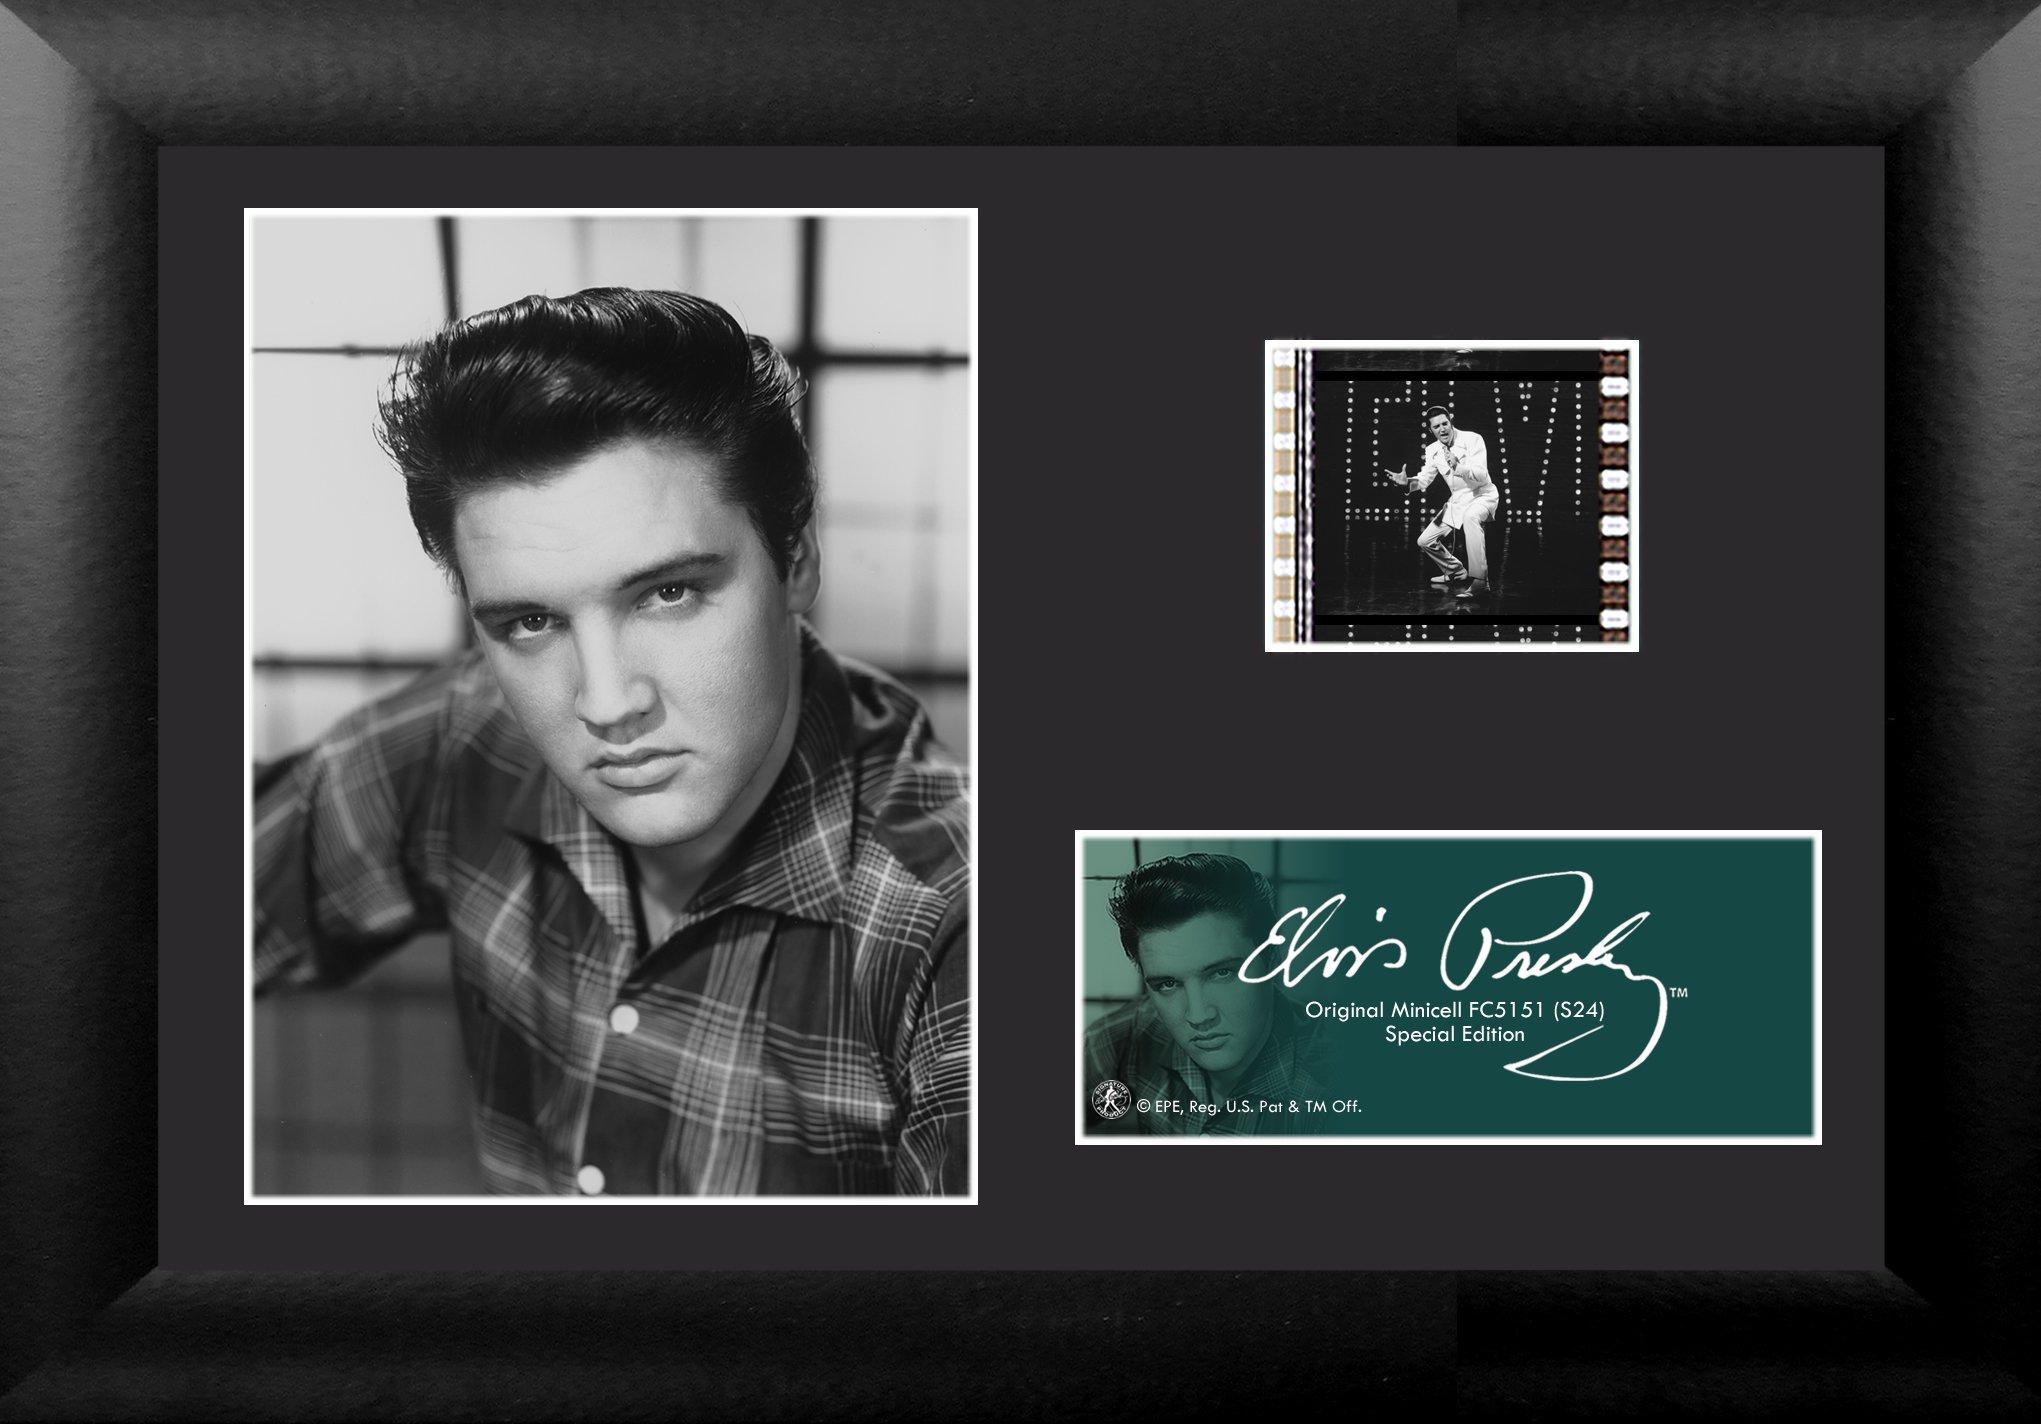 Trend Setters Ltd Elvis Presley S24 Minicell Film